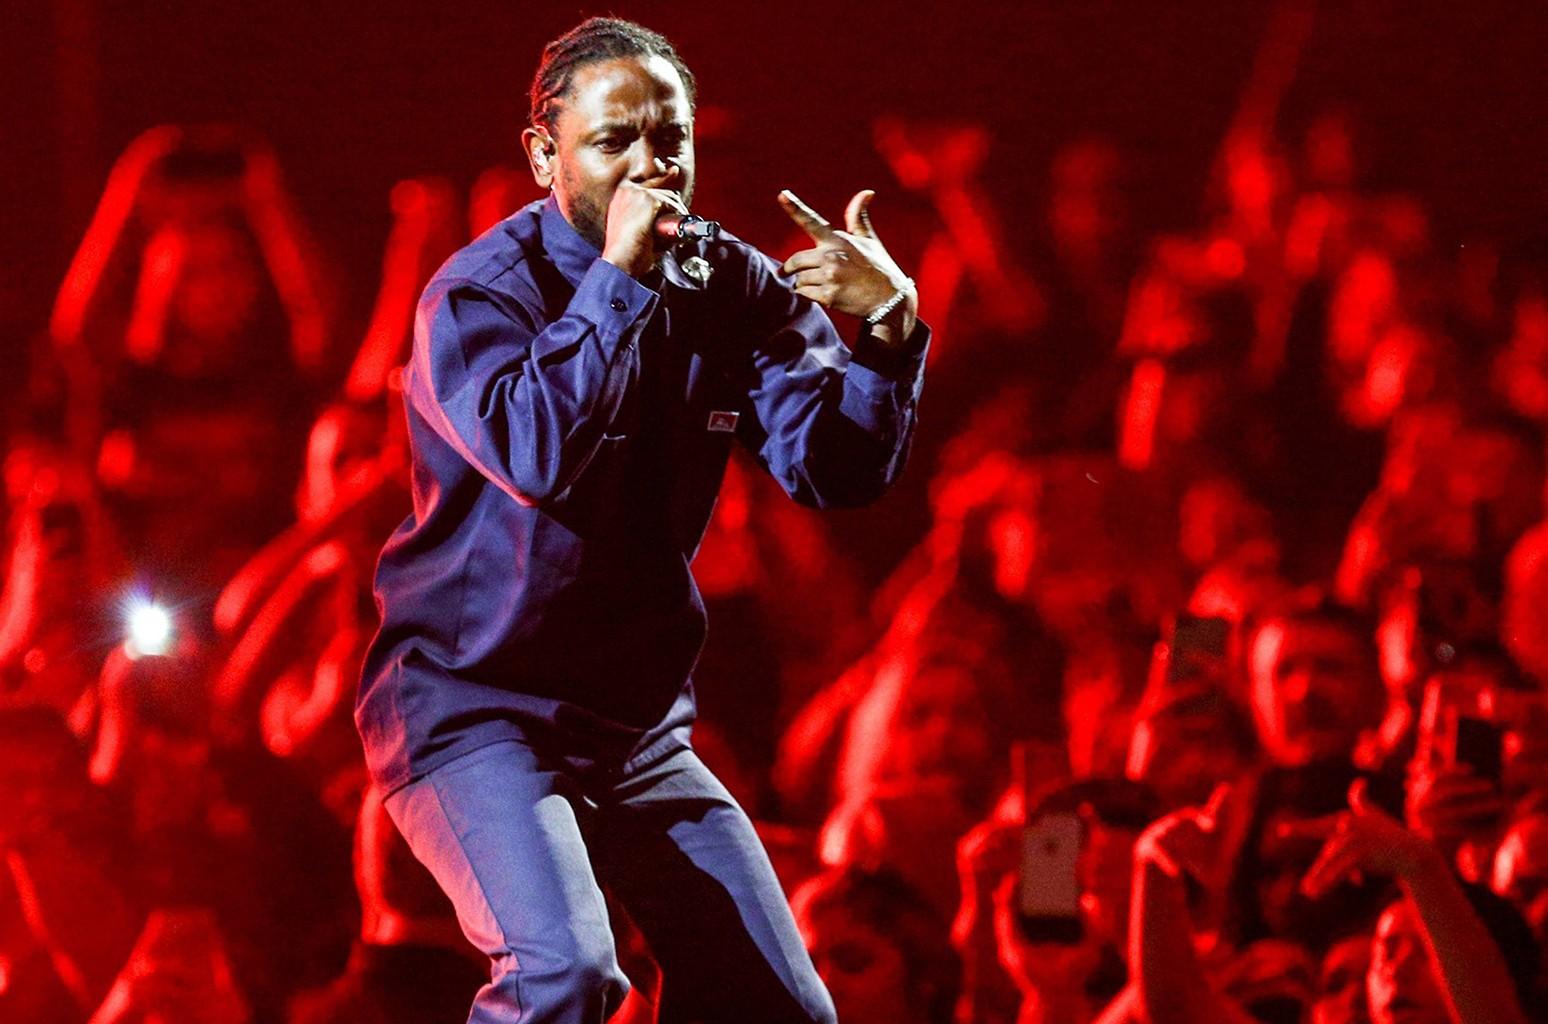 Kendrick Lamar performs on April 29, 2017 at The Forum in Inglewood, Calif.